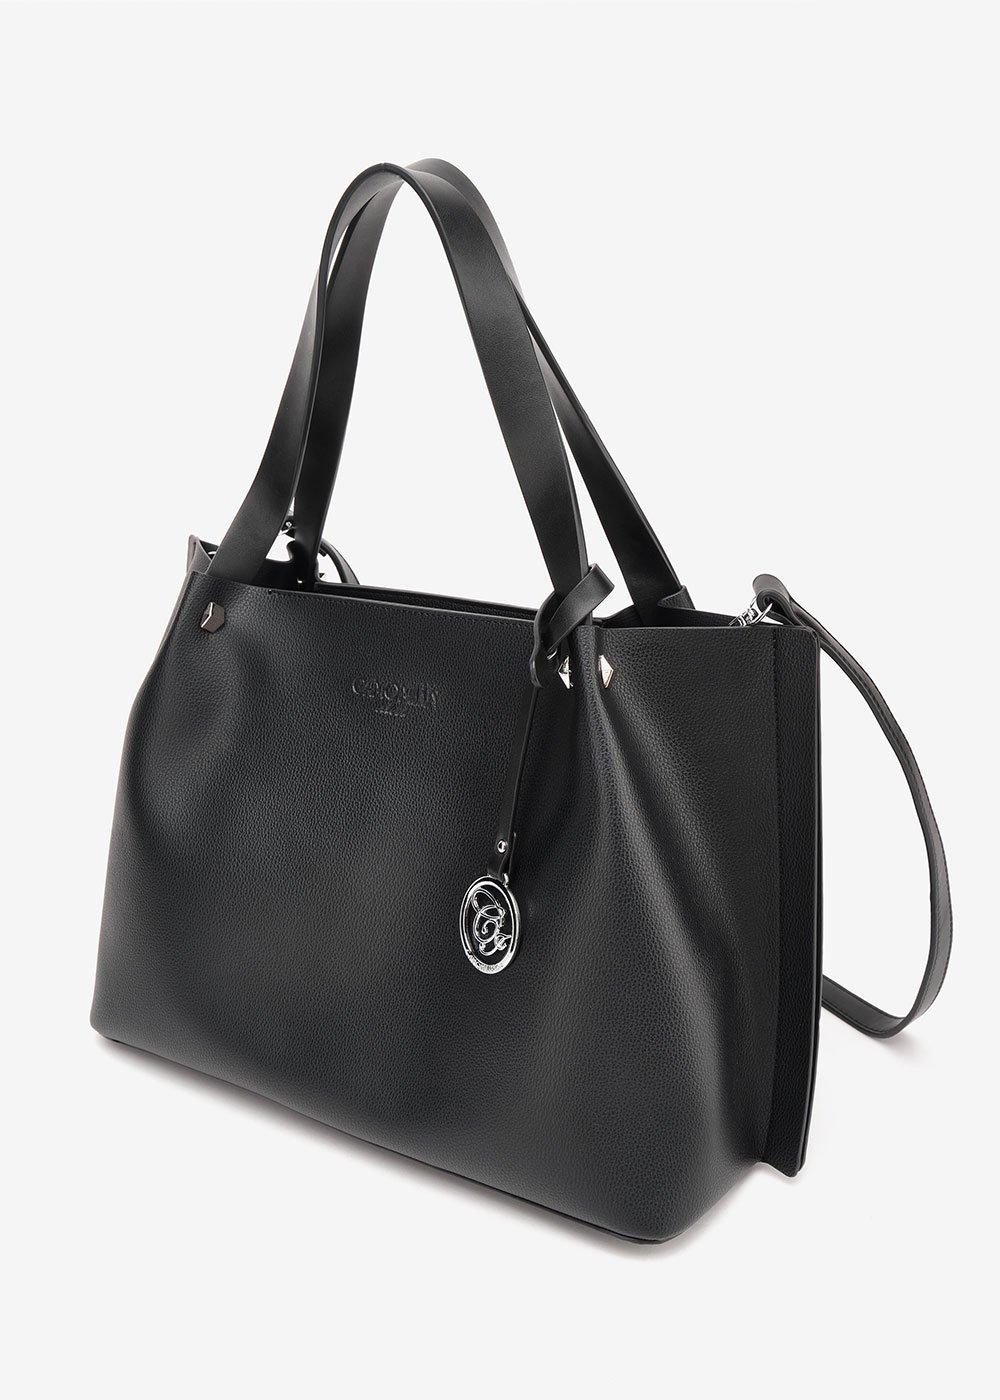 Banny shopping bag with logo pendant - Black - Woman